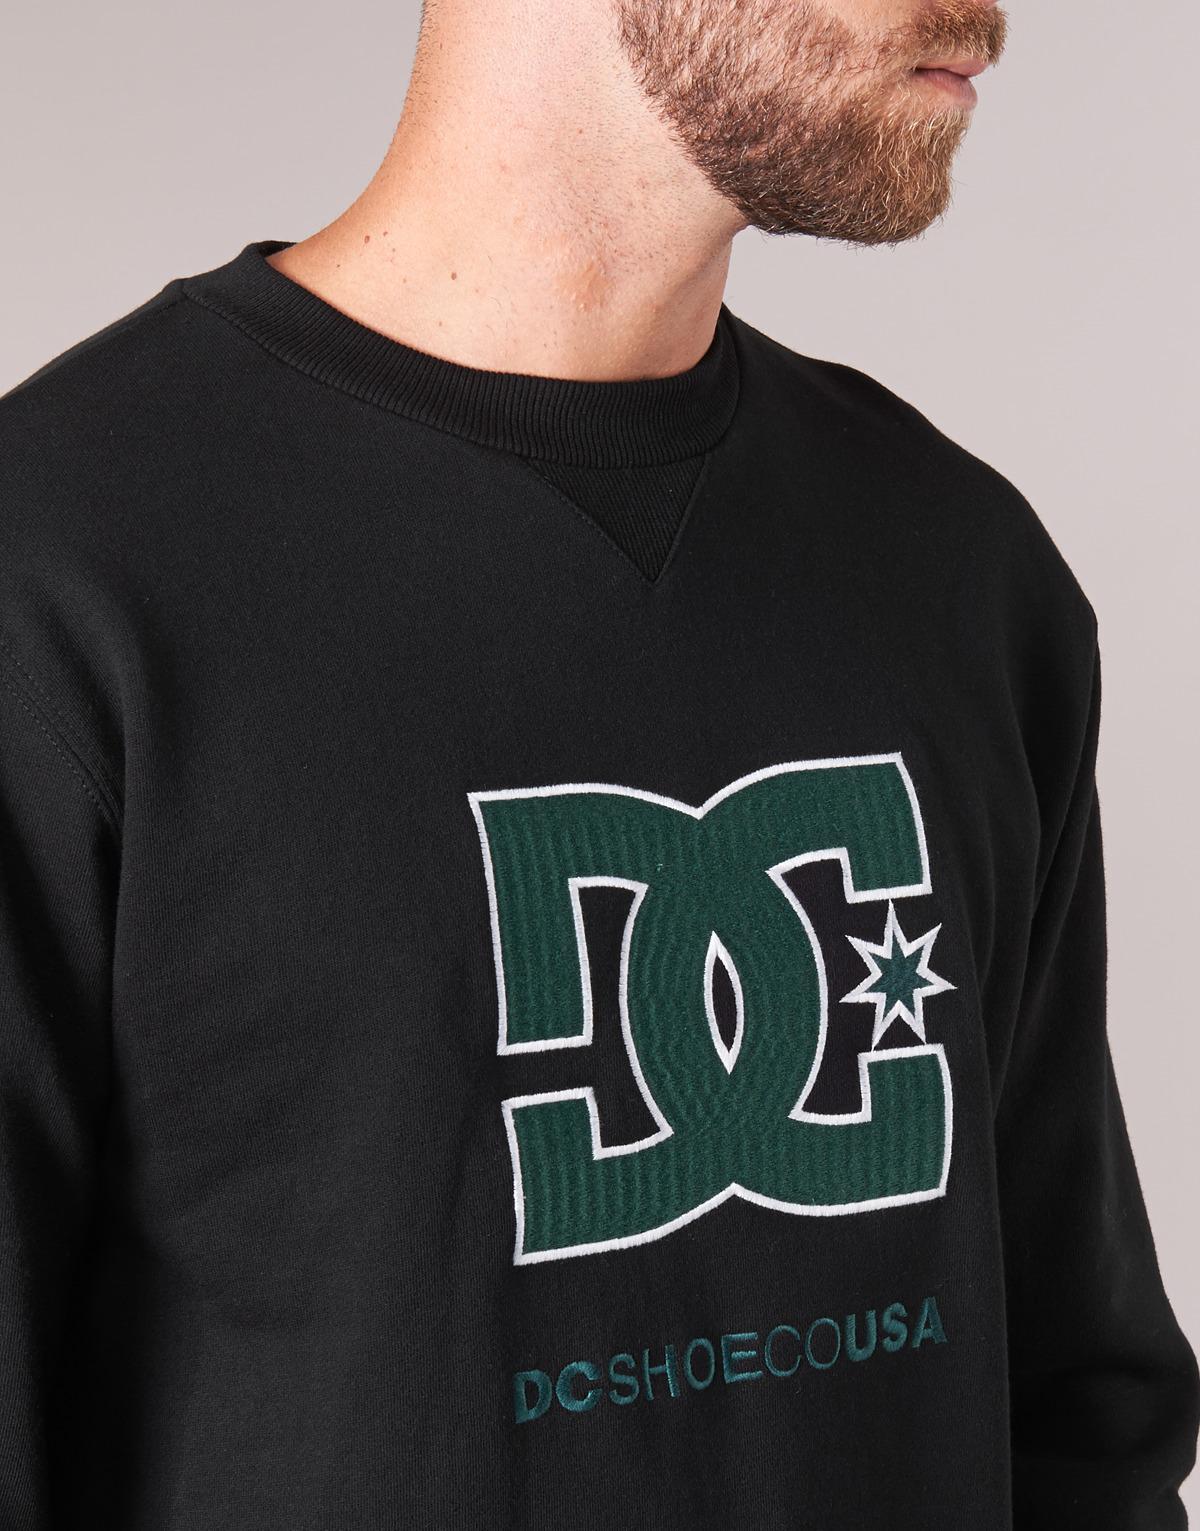 En Otlr Noir Kvj0 M Sweat Lyst Dc Hommes Shirt Wphqew Crew Glenridge w6qaY